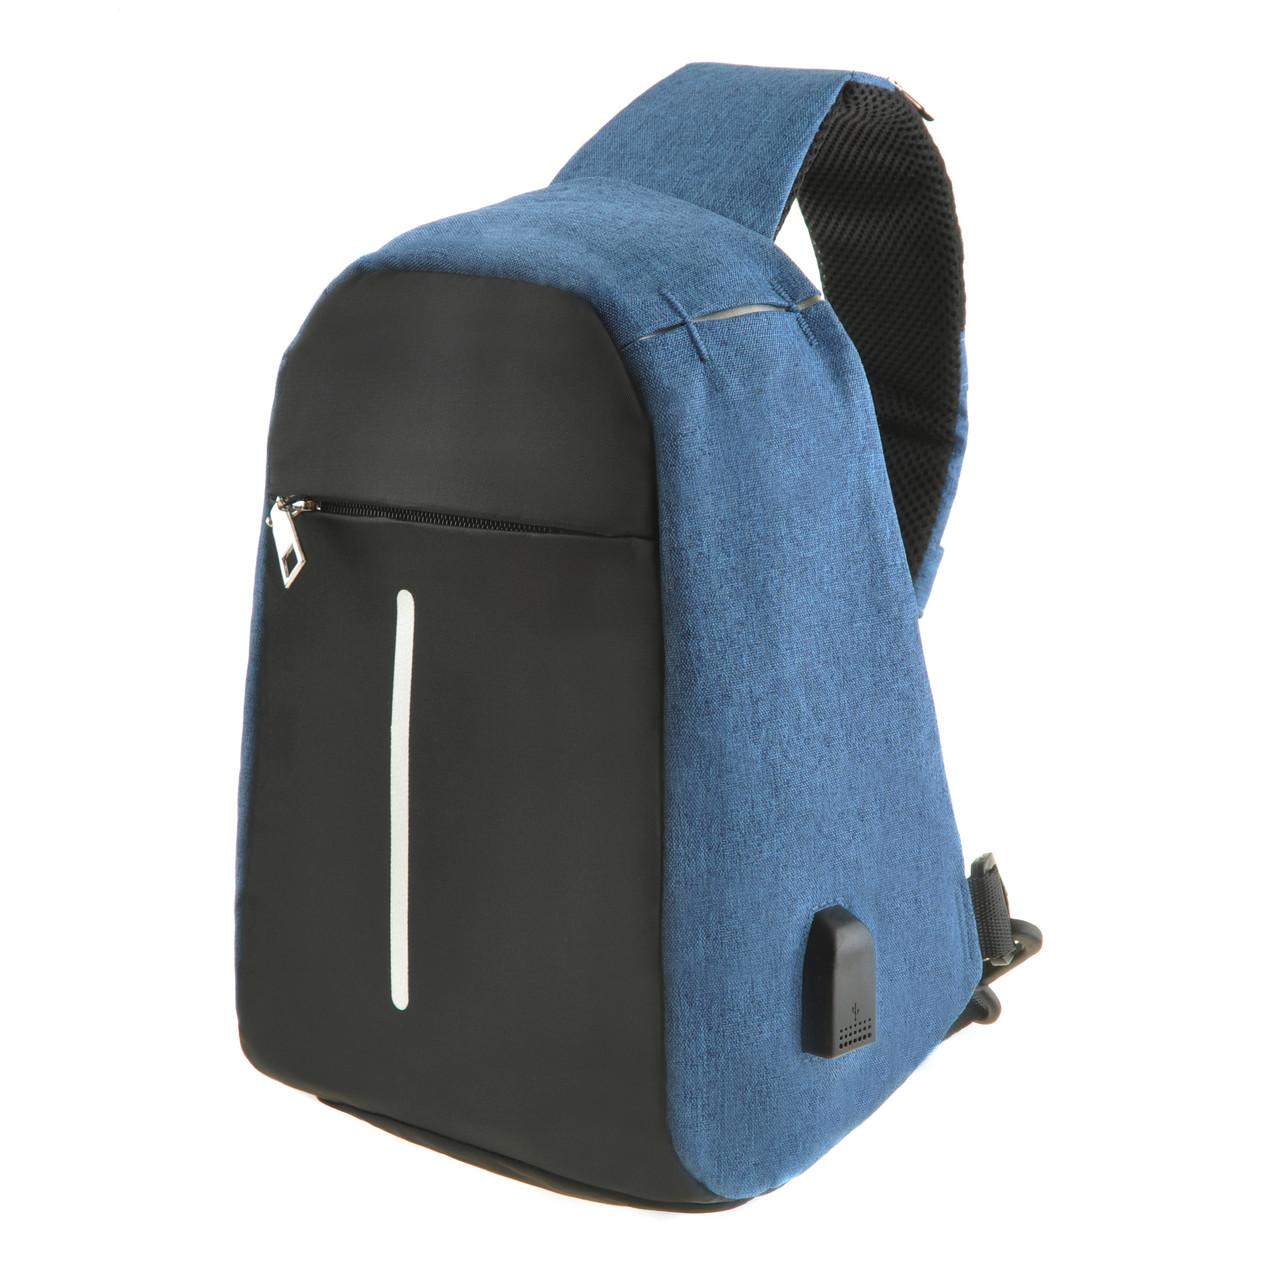 Рюкзак антивор однолямочный Bobby Mini 10х19х30 чёрно-голубой, водонепроницаемый ксНЛ1689гол